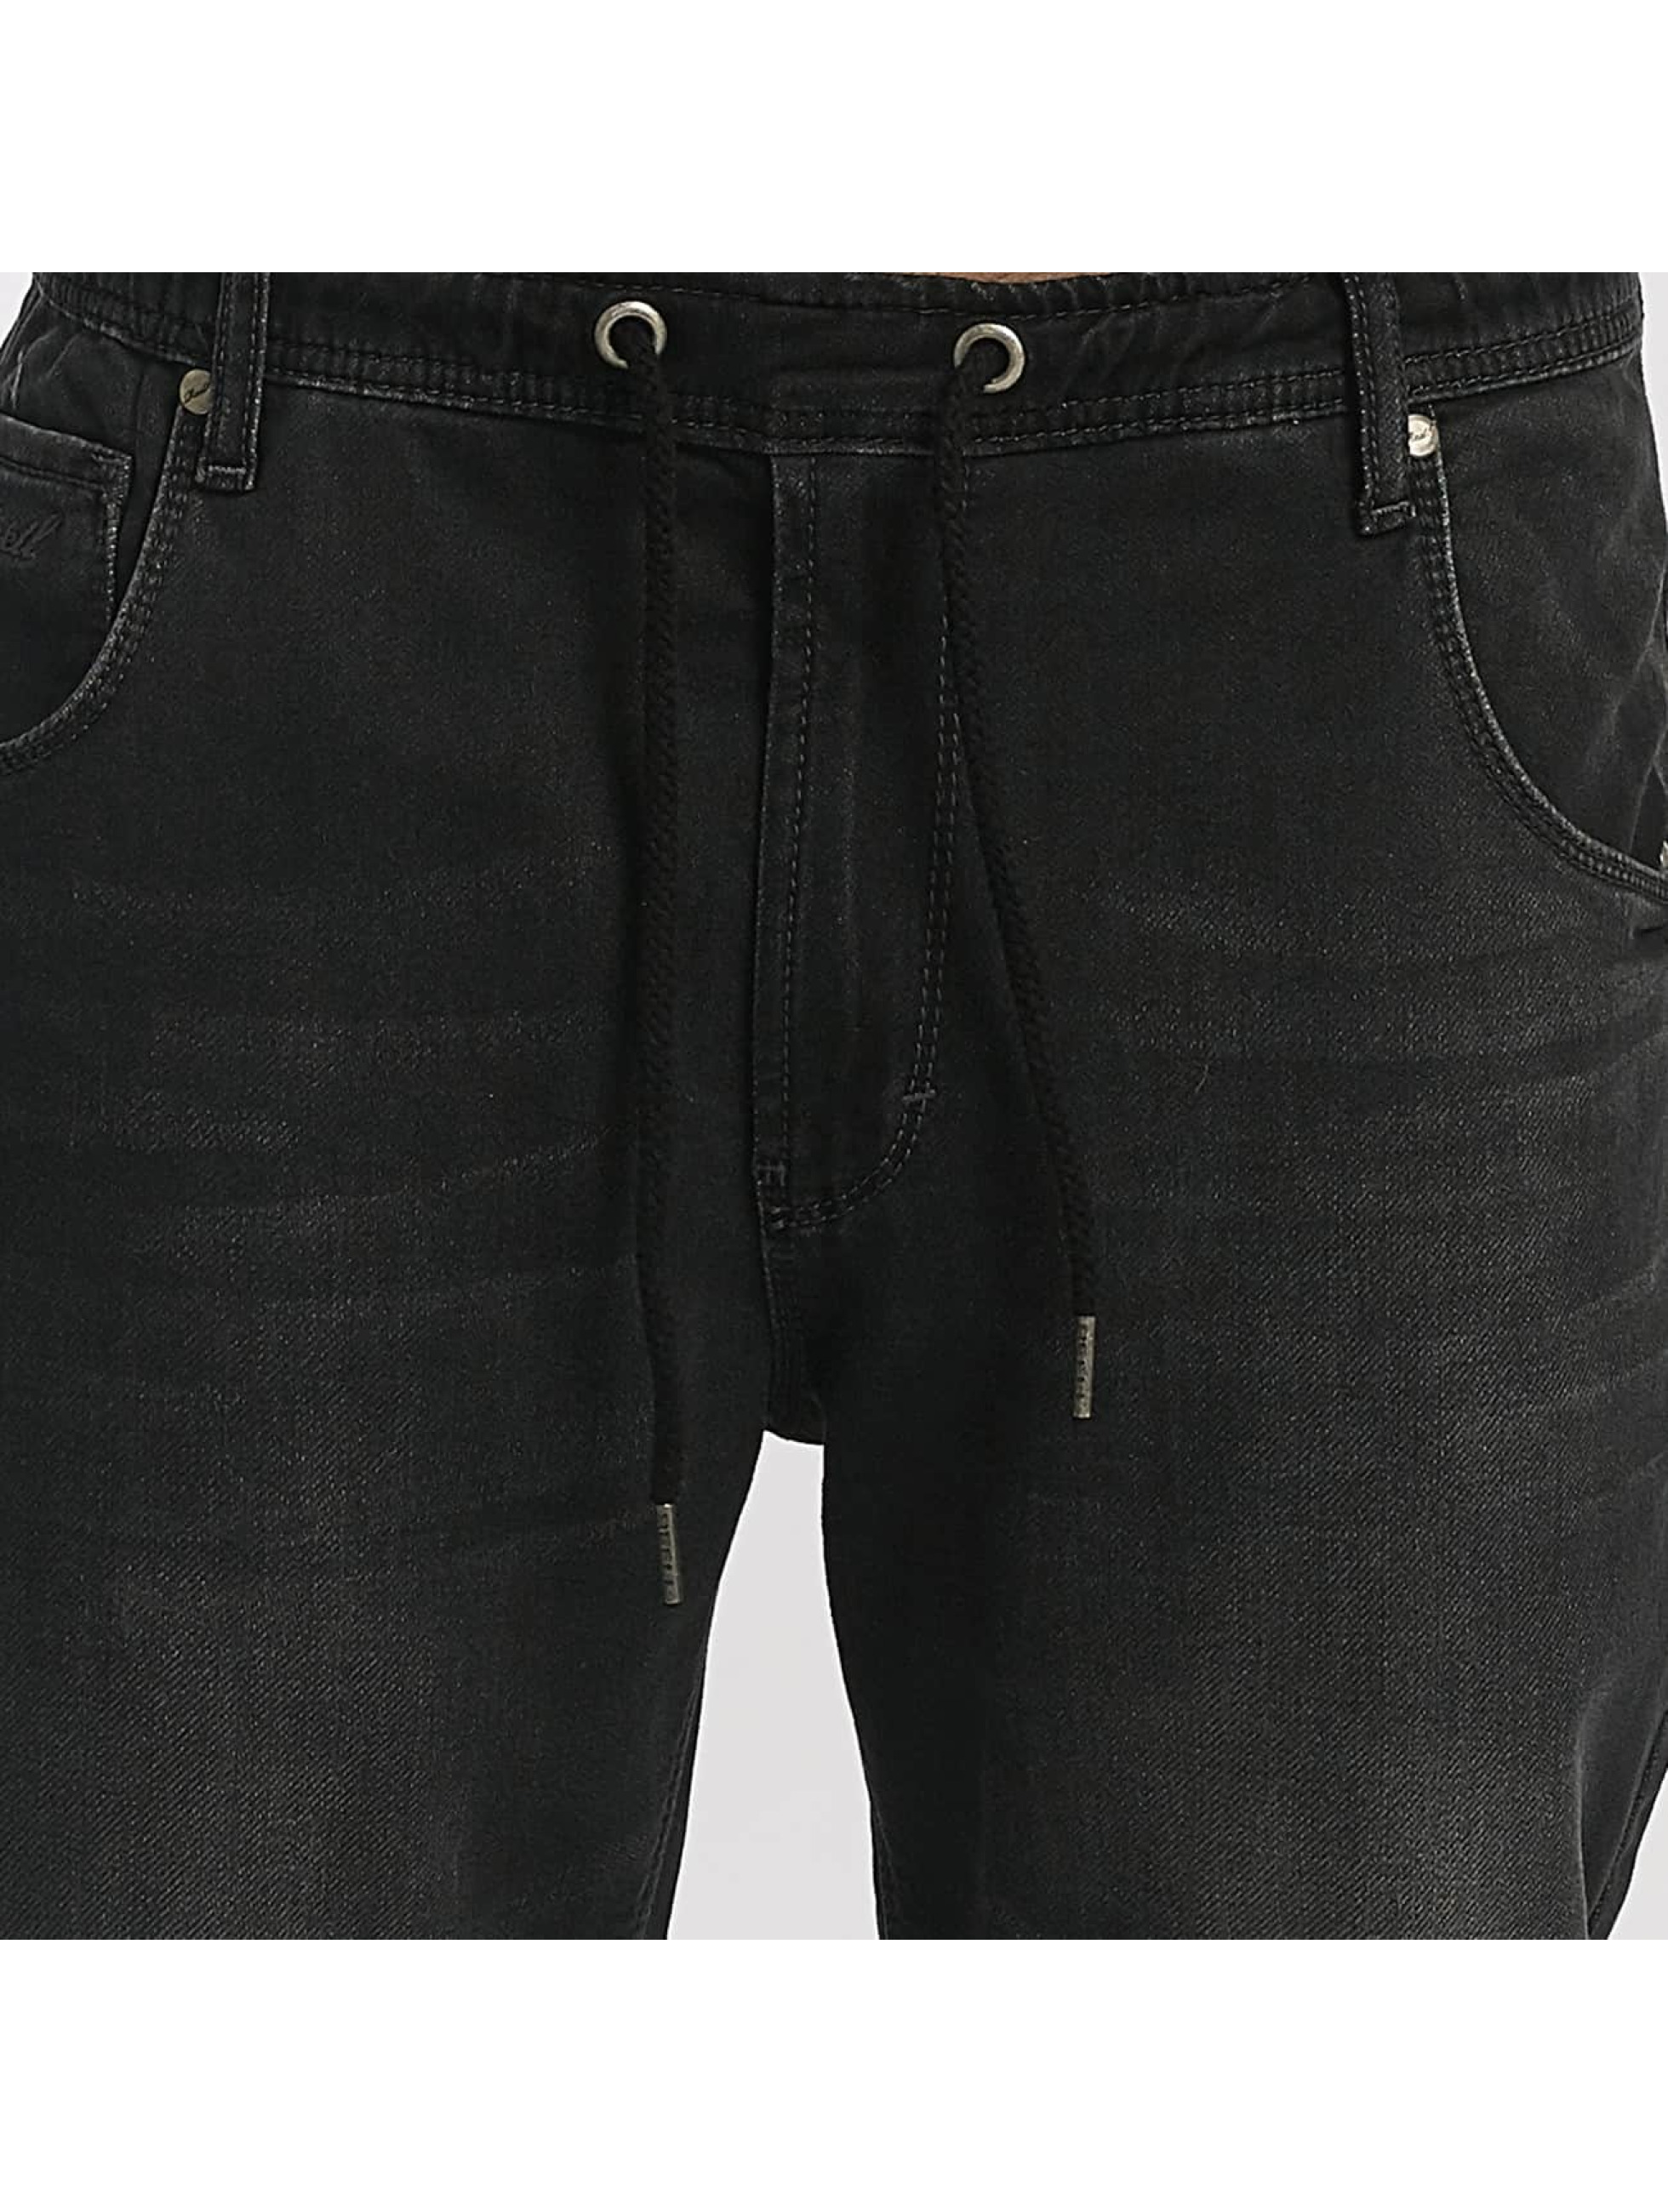 Reell Jeans Joggingbukser Jogger sort